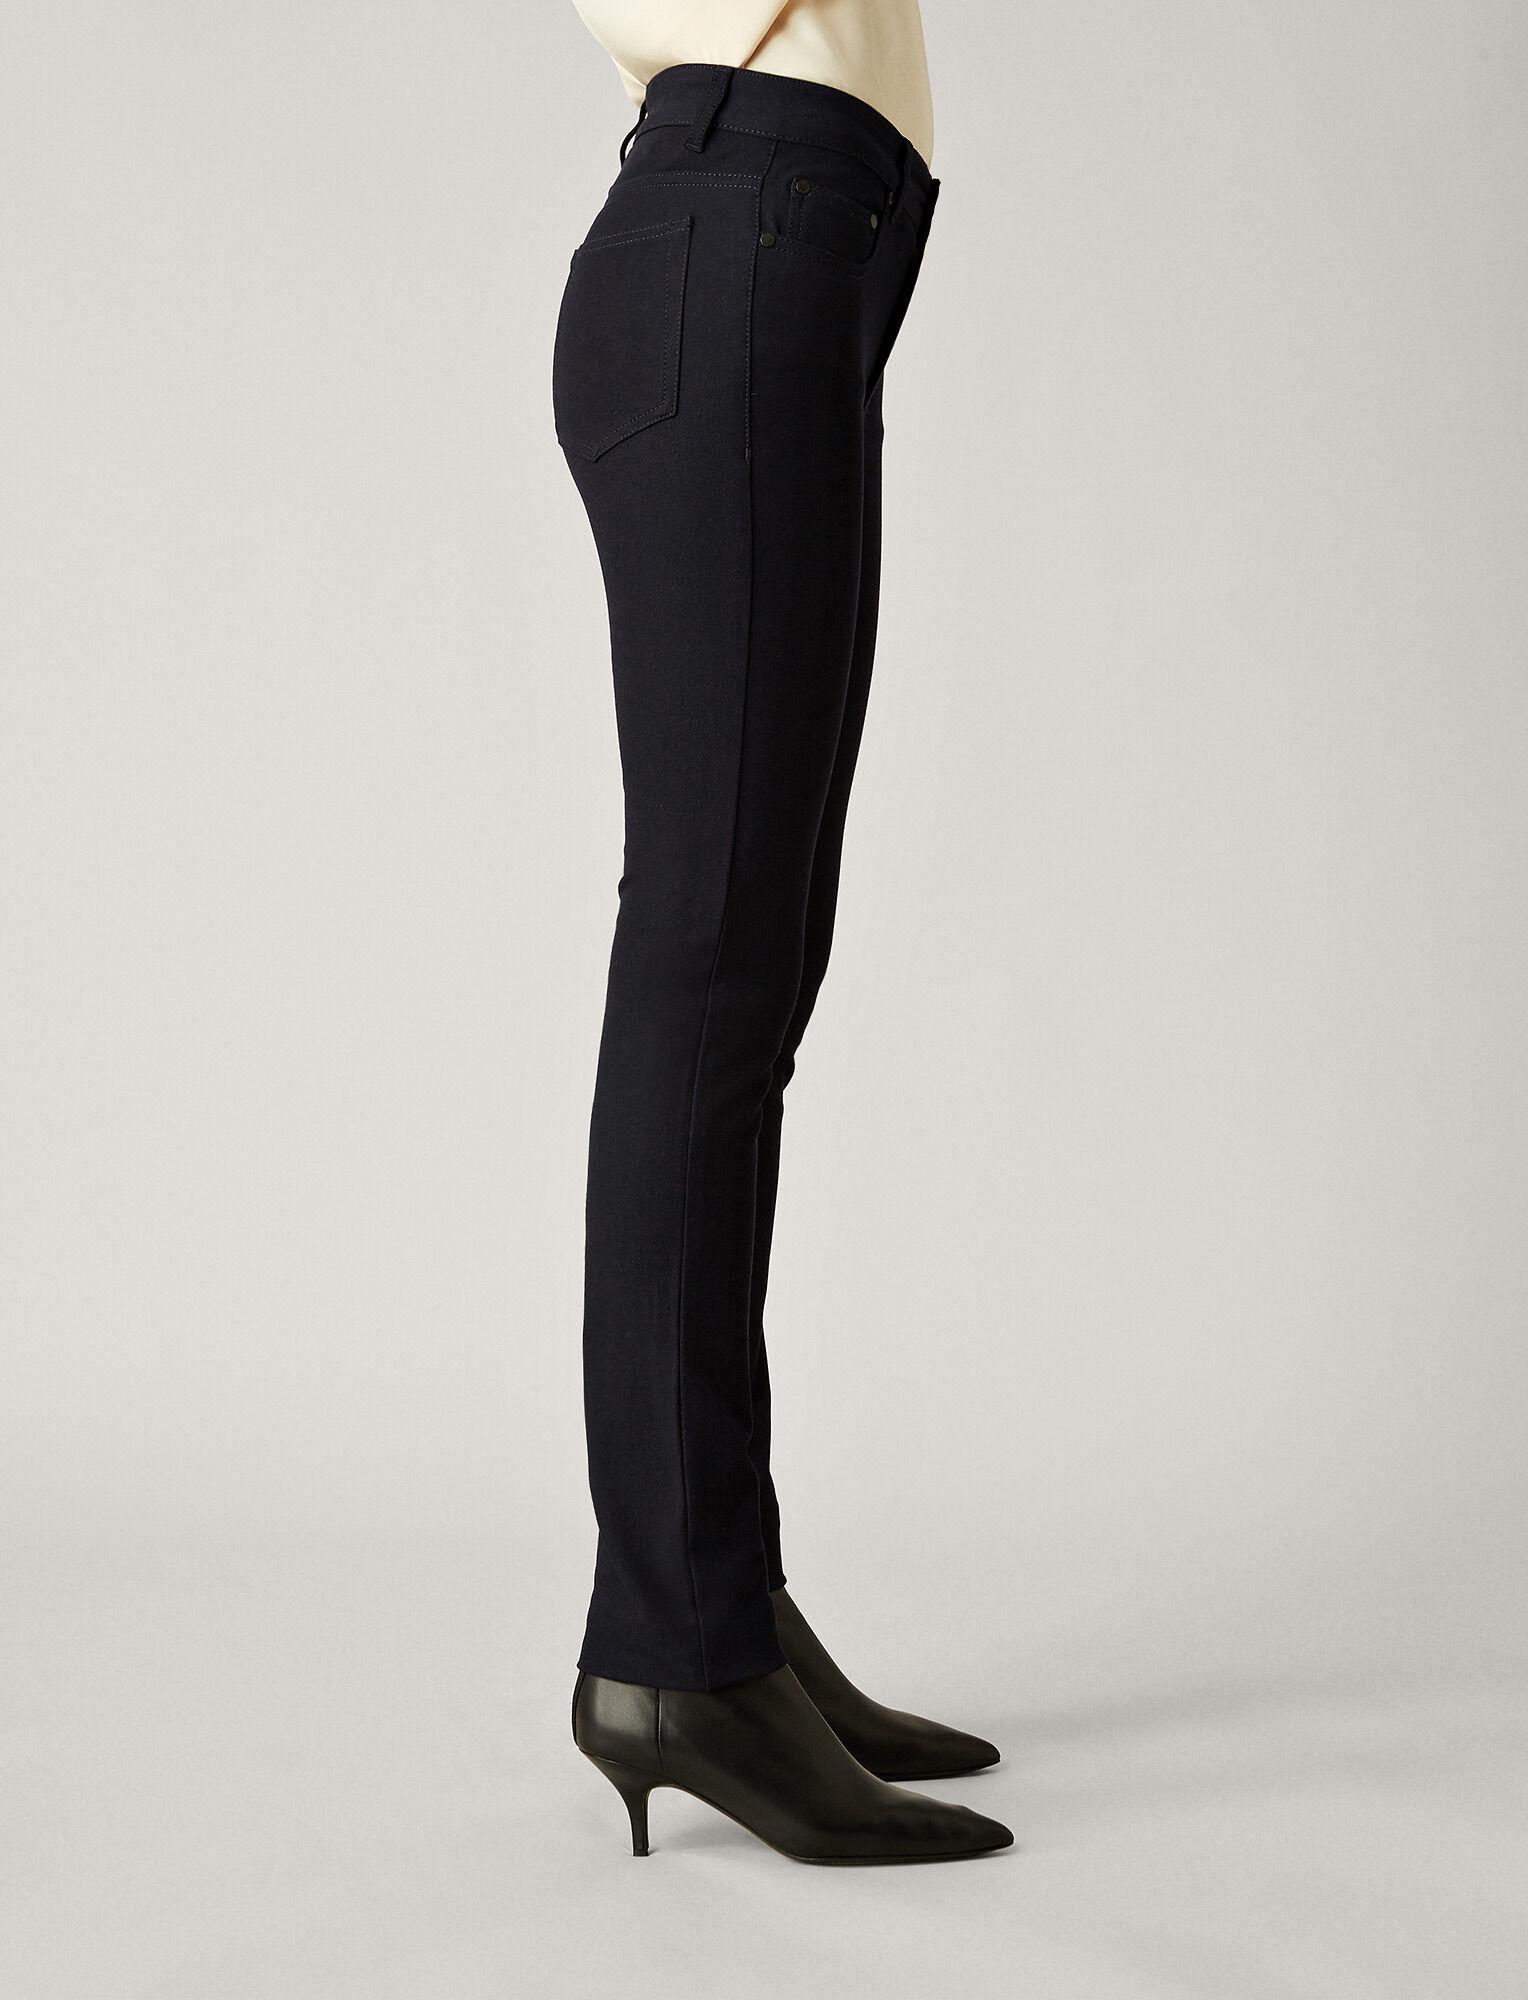 Joseph, Cloud Gabardine Stretch Trousers, in NAVY